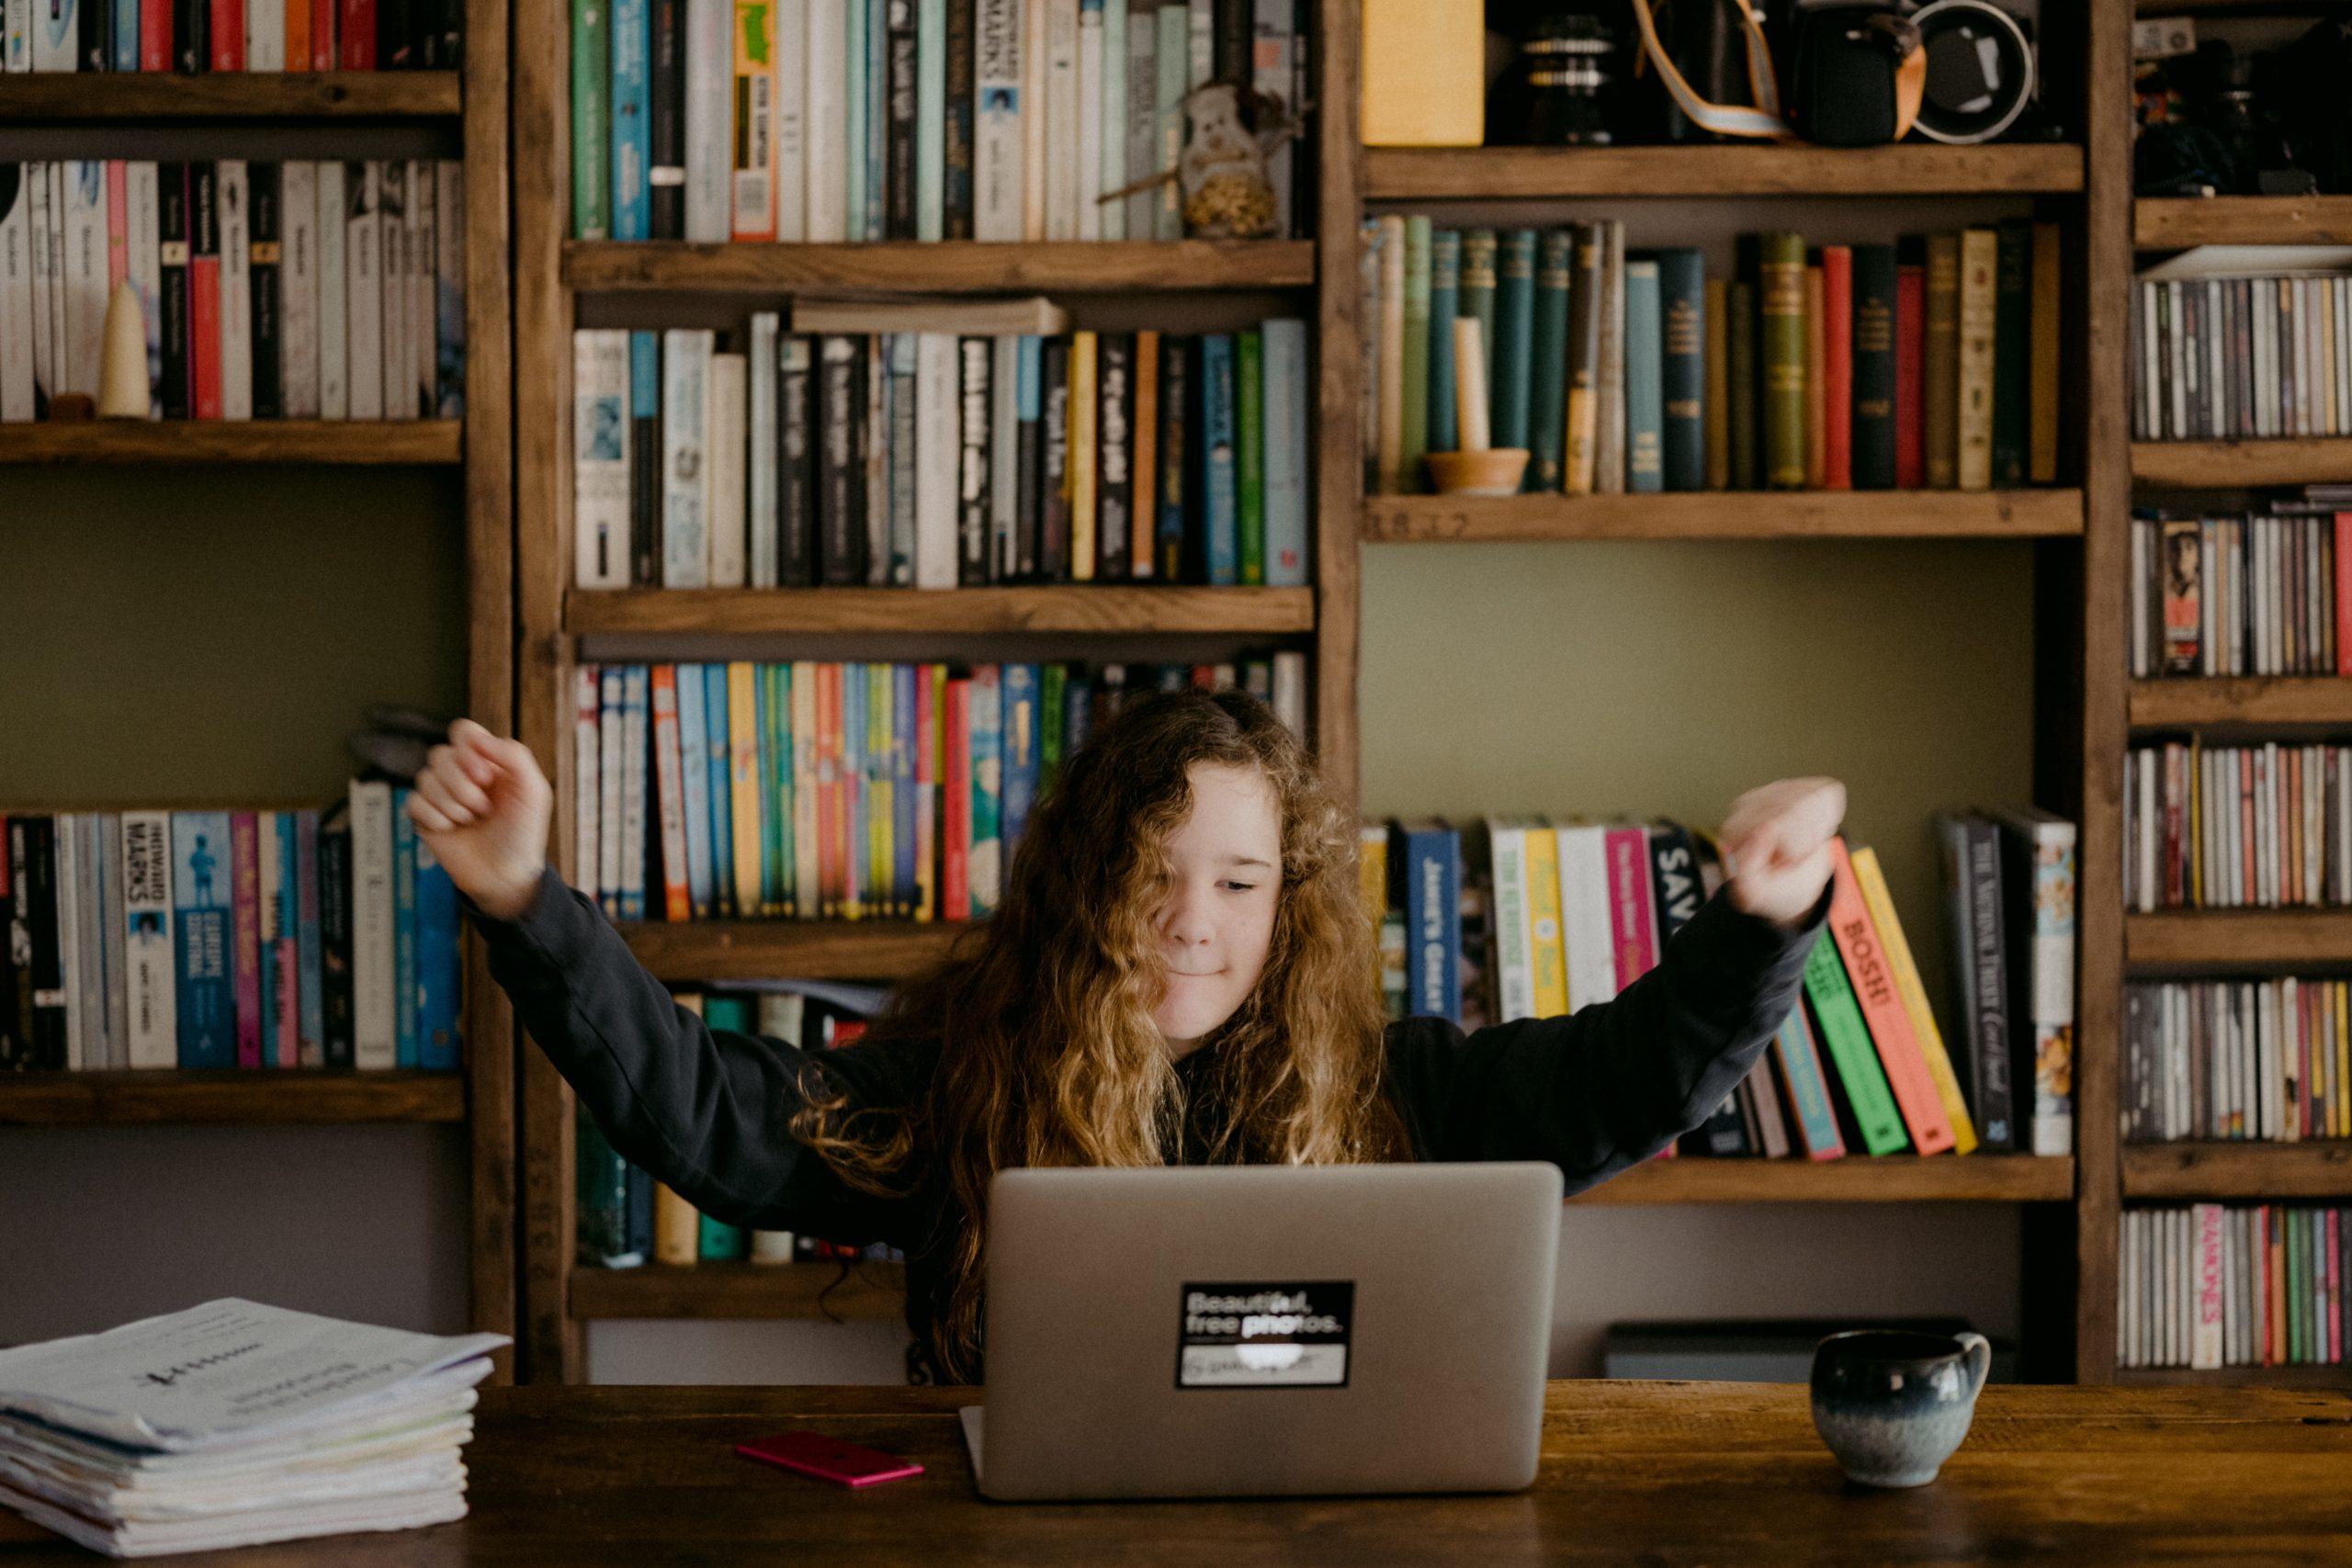 girl celebrating at her computer